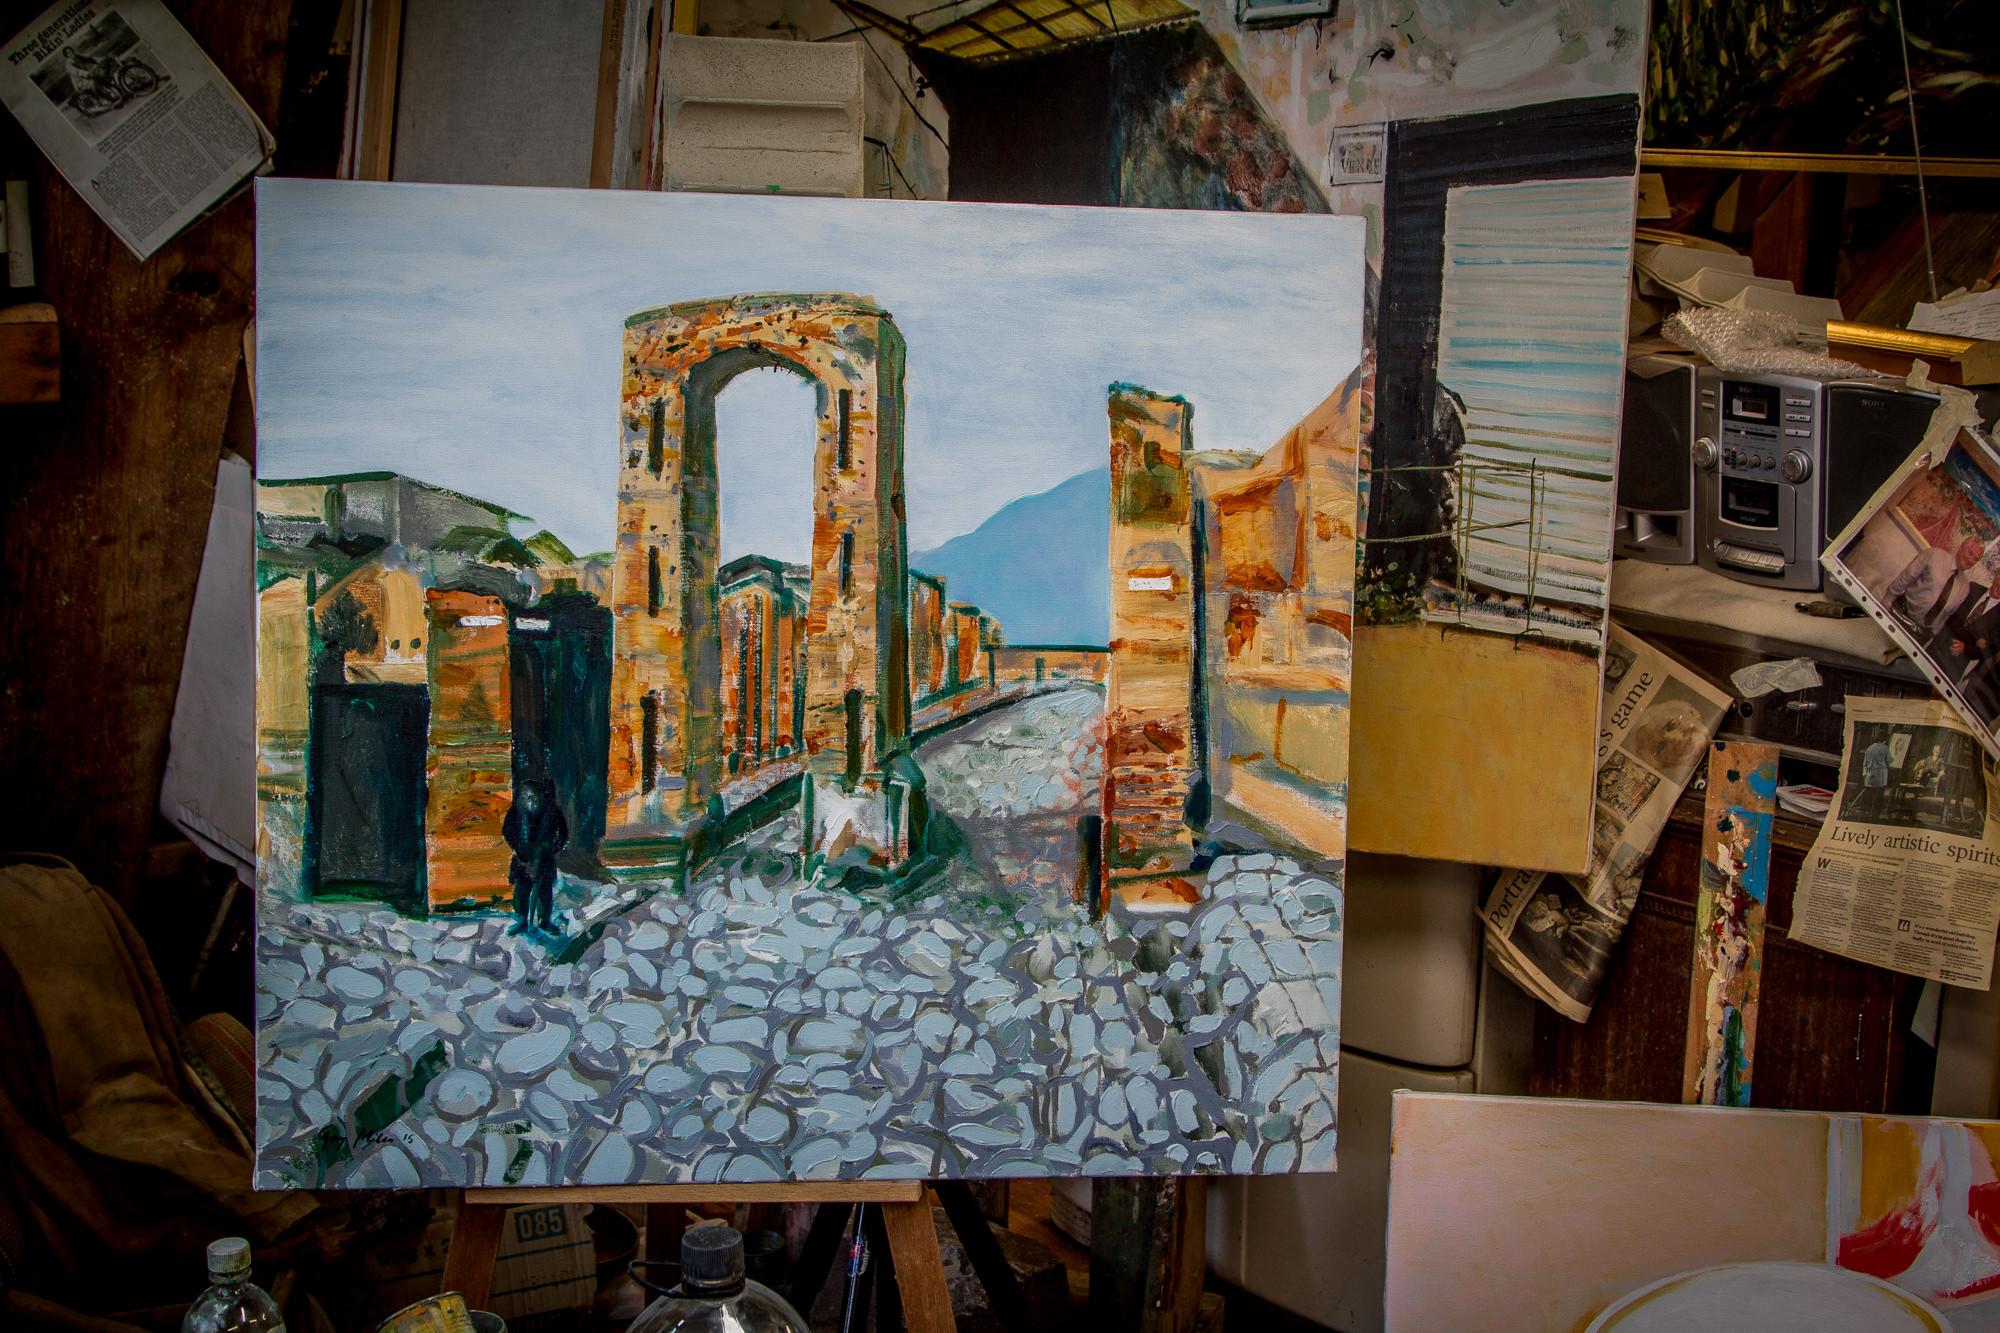 garymiles-ITALIA-Venice-Rome-Calabria-web-48.jpg